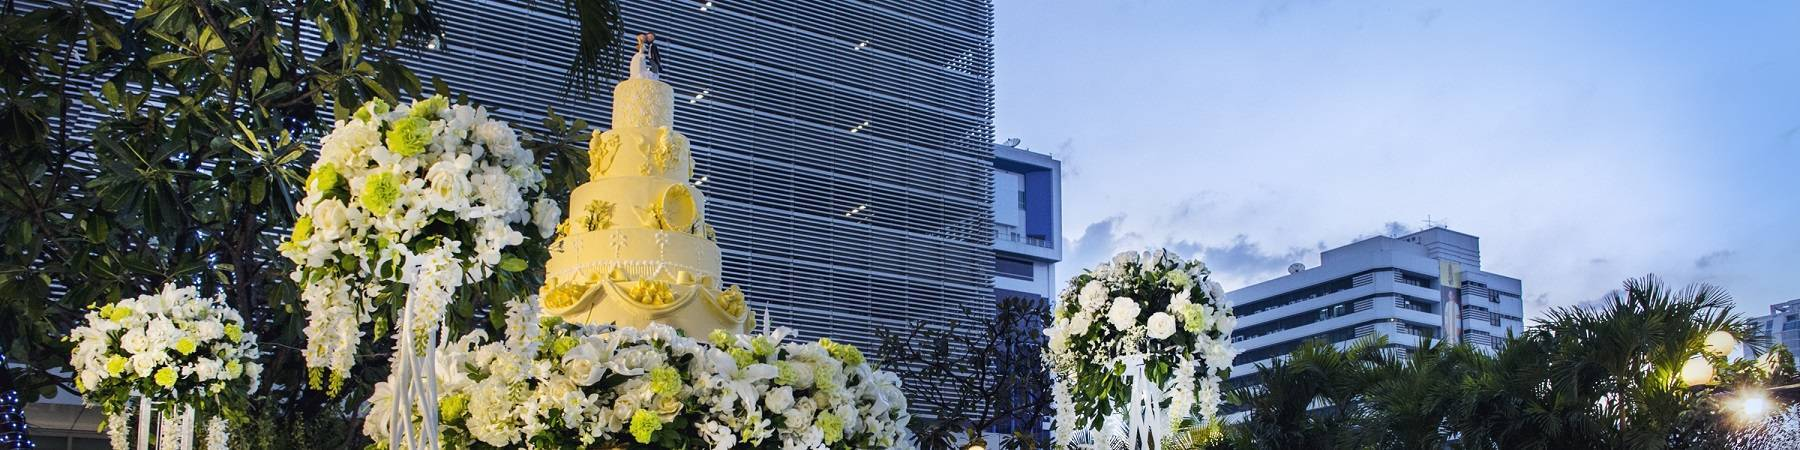 wedding-venue-in-bangkok